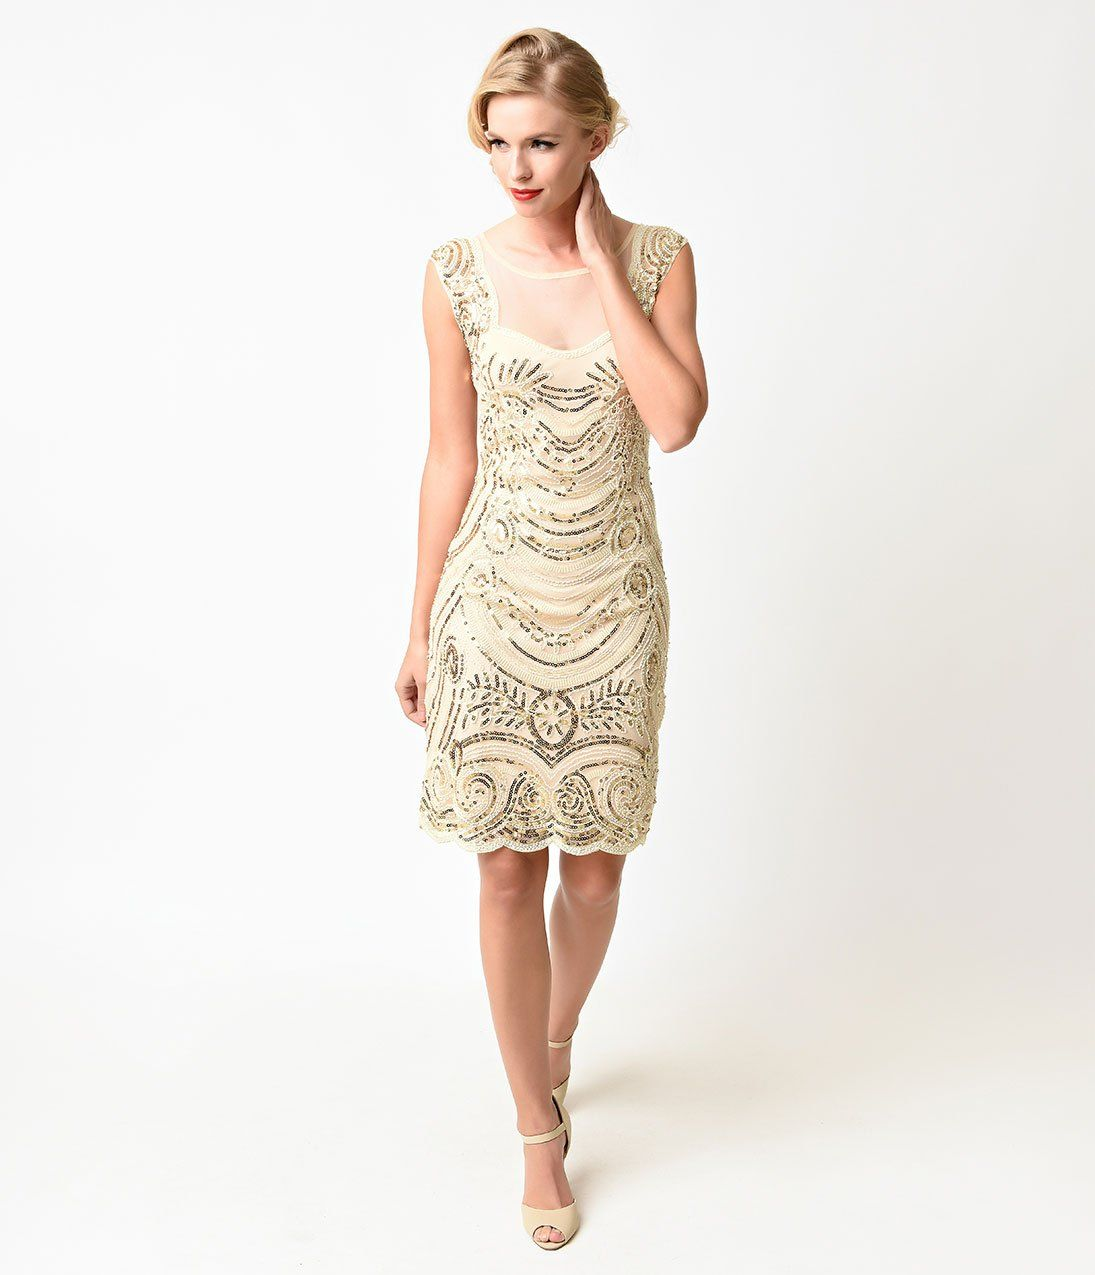 9f798f8cb0 Great Gatsby Dress – Great Gatsby Dresses for Sale 1920s Deco Illusion  Short Flapper Dress  50.00 AT vintagedancer.com